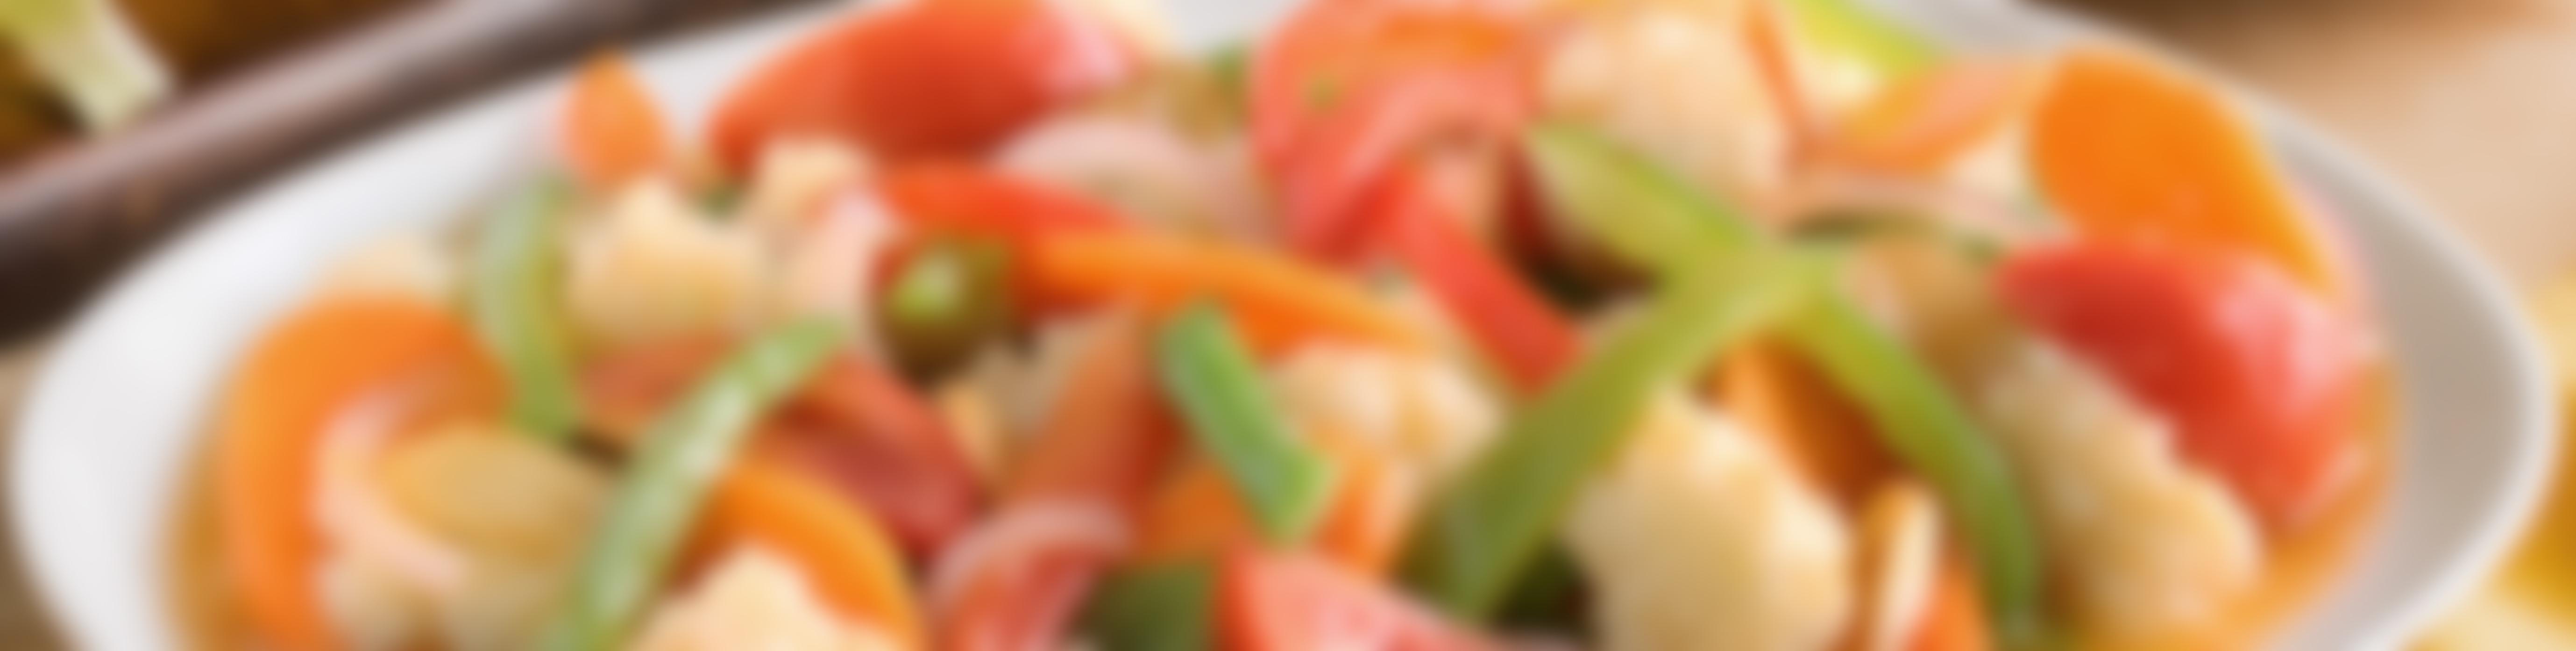 Ginisang Sari-saring Gulay